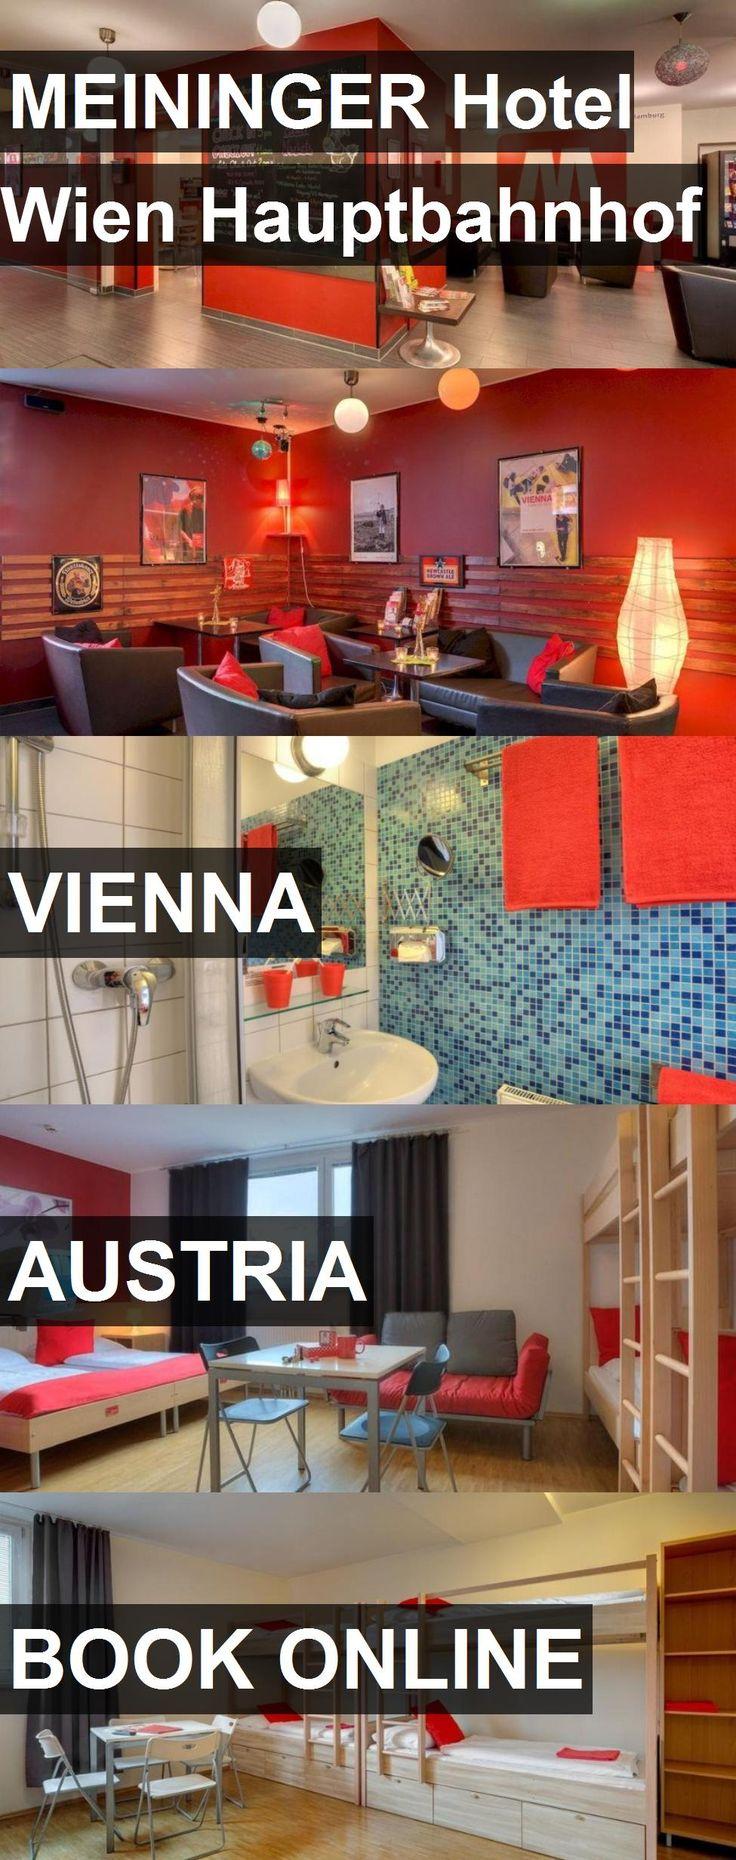 MEININGER Hotel Wien Hauptbahnhof in Vienna, Austria. For more information, photos, reviews and best prices please follow the link. #Austria #Vienna #travel #vacation #hotel